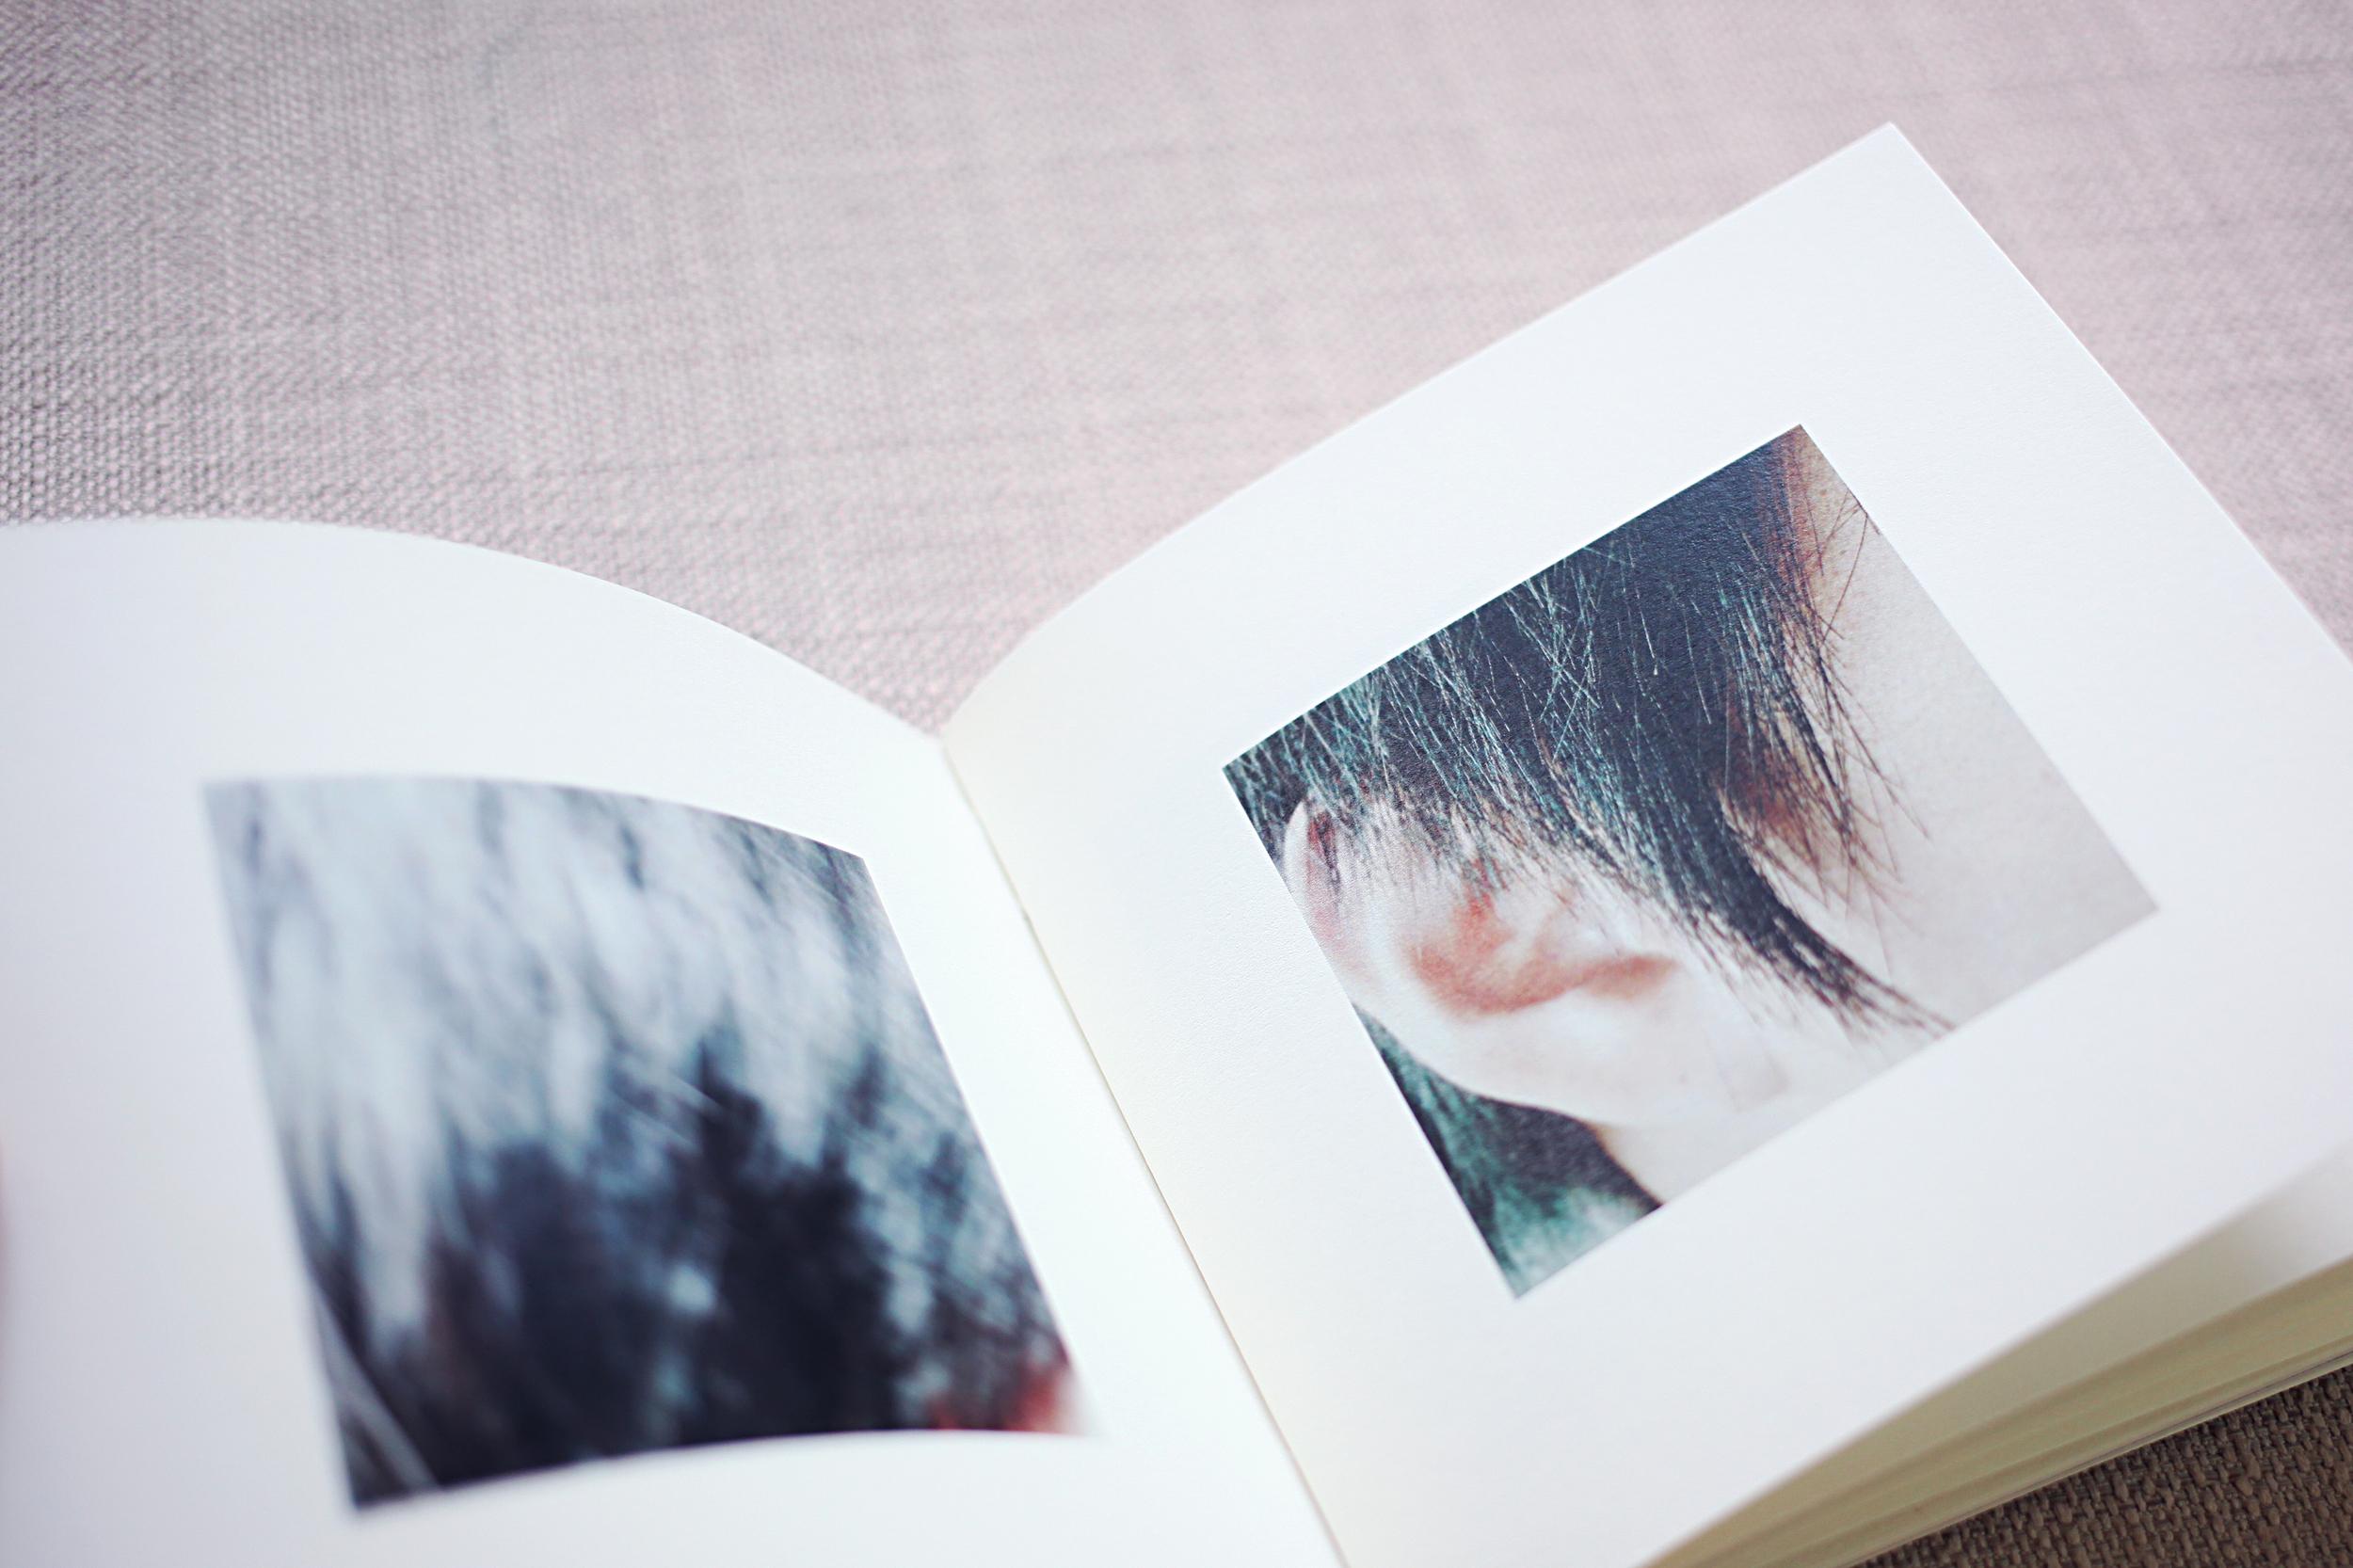 IMG_9142.JPG